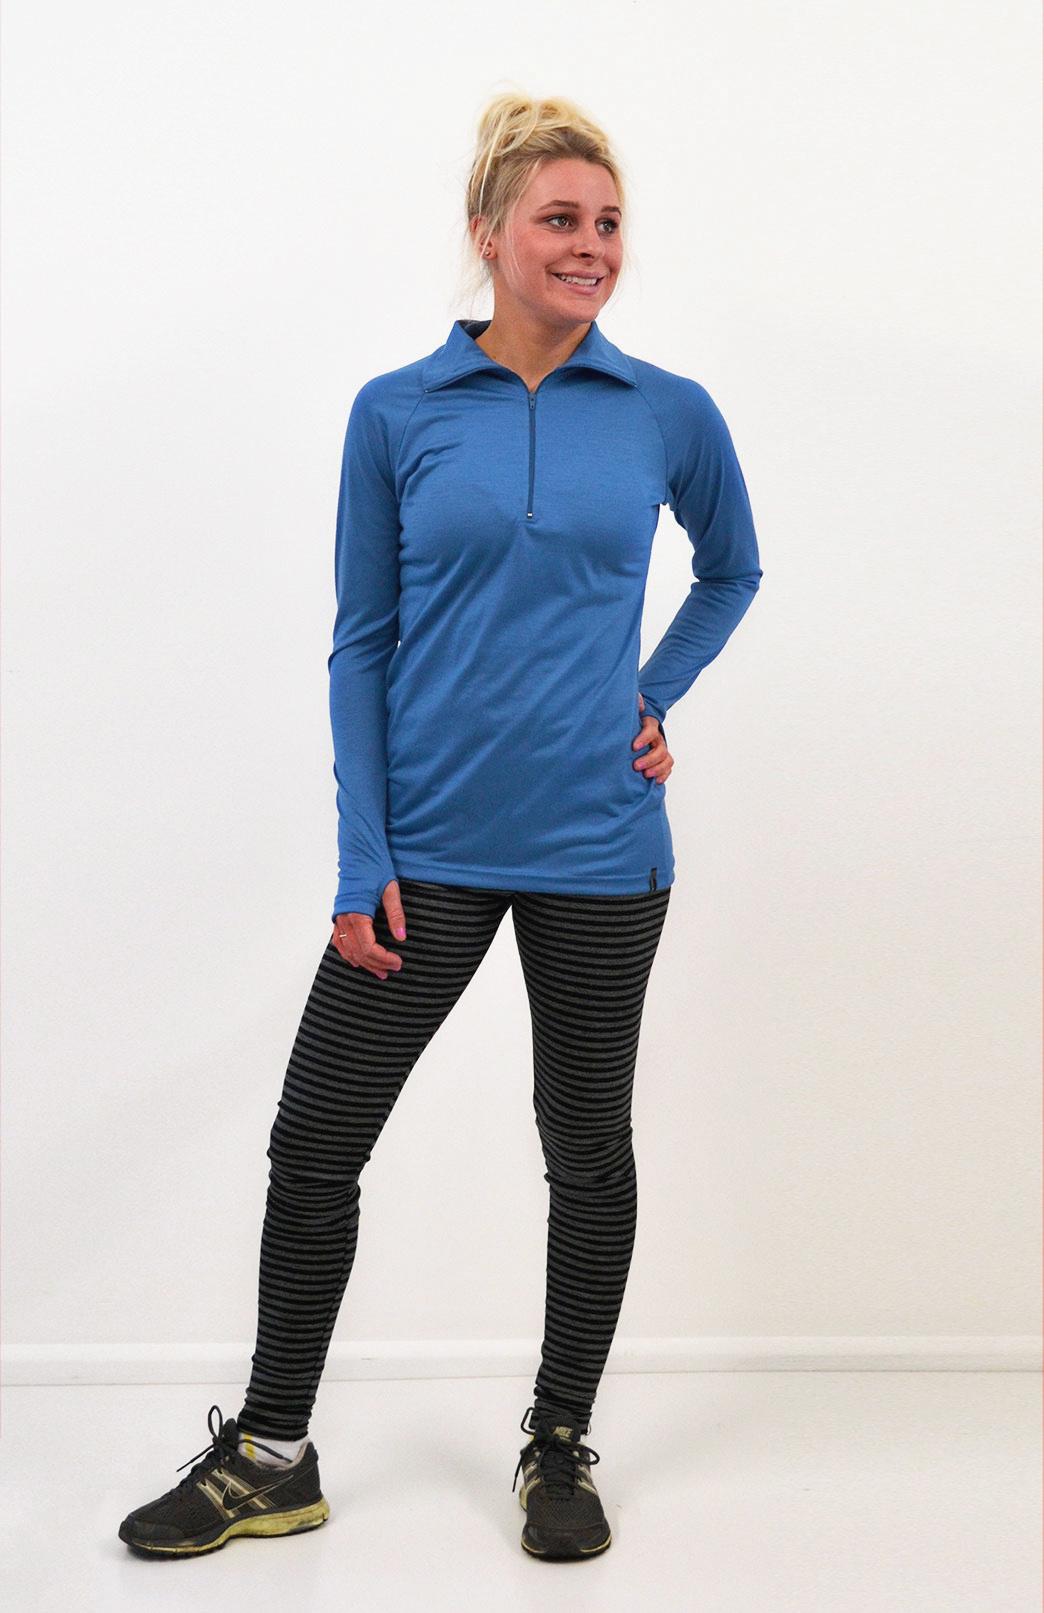 Zip Neck Top - Ultralight (170g) - Women's Bright Blue Ultralight Wool Zip Neck Pullover Style Top with Thumb Holes - Smitten Merino Tasmania Australia